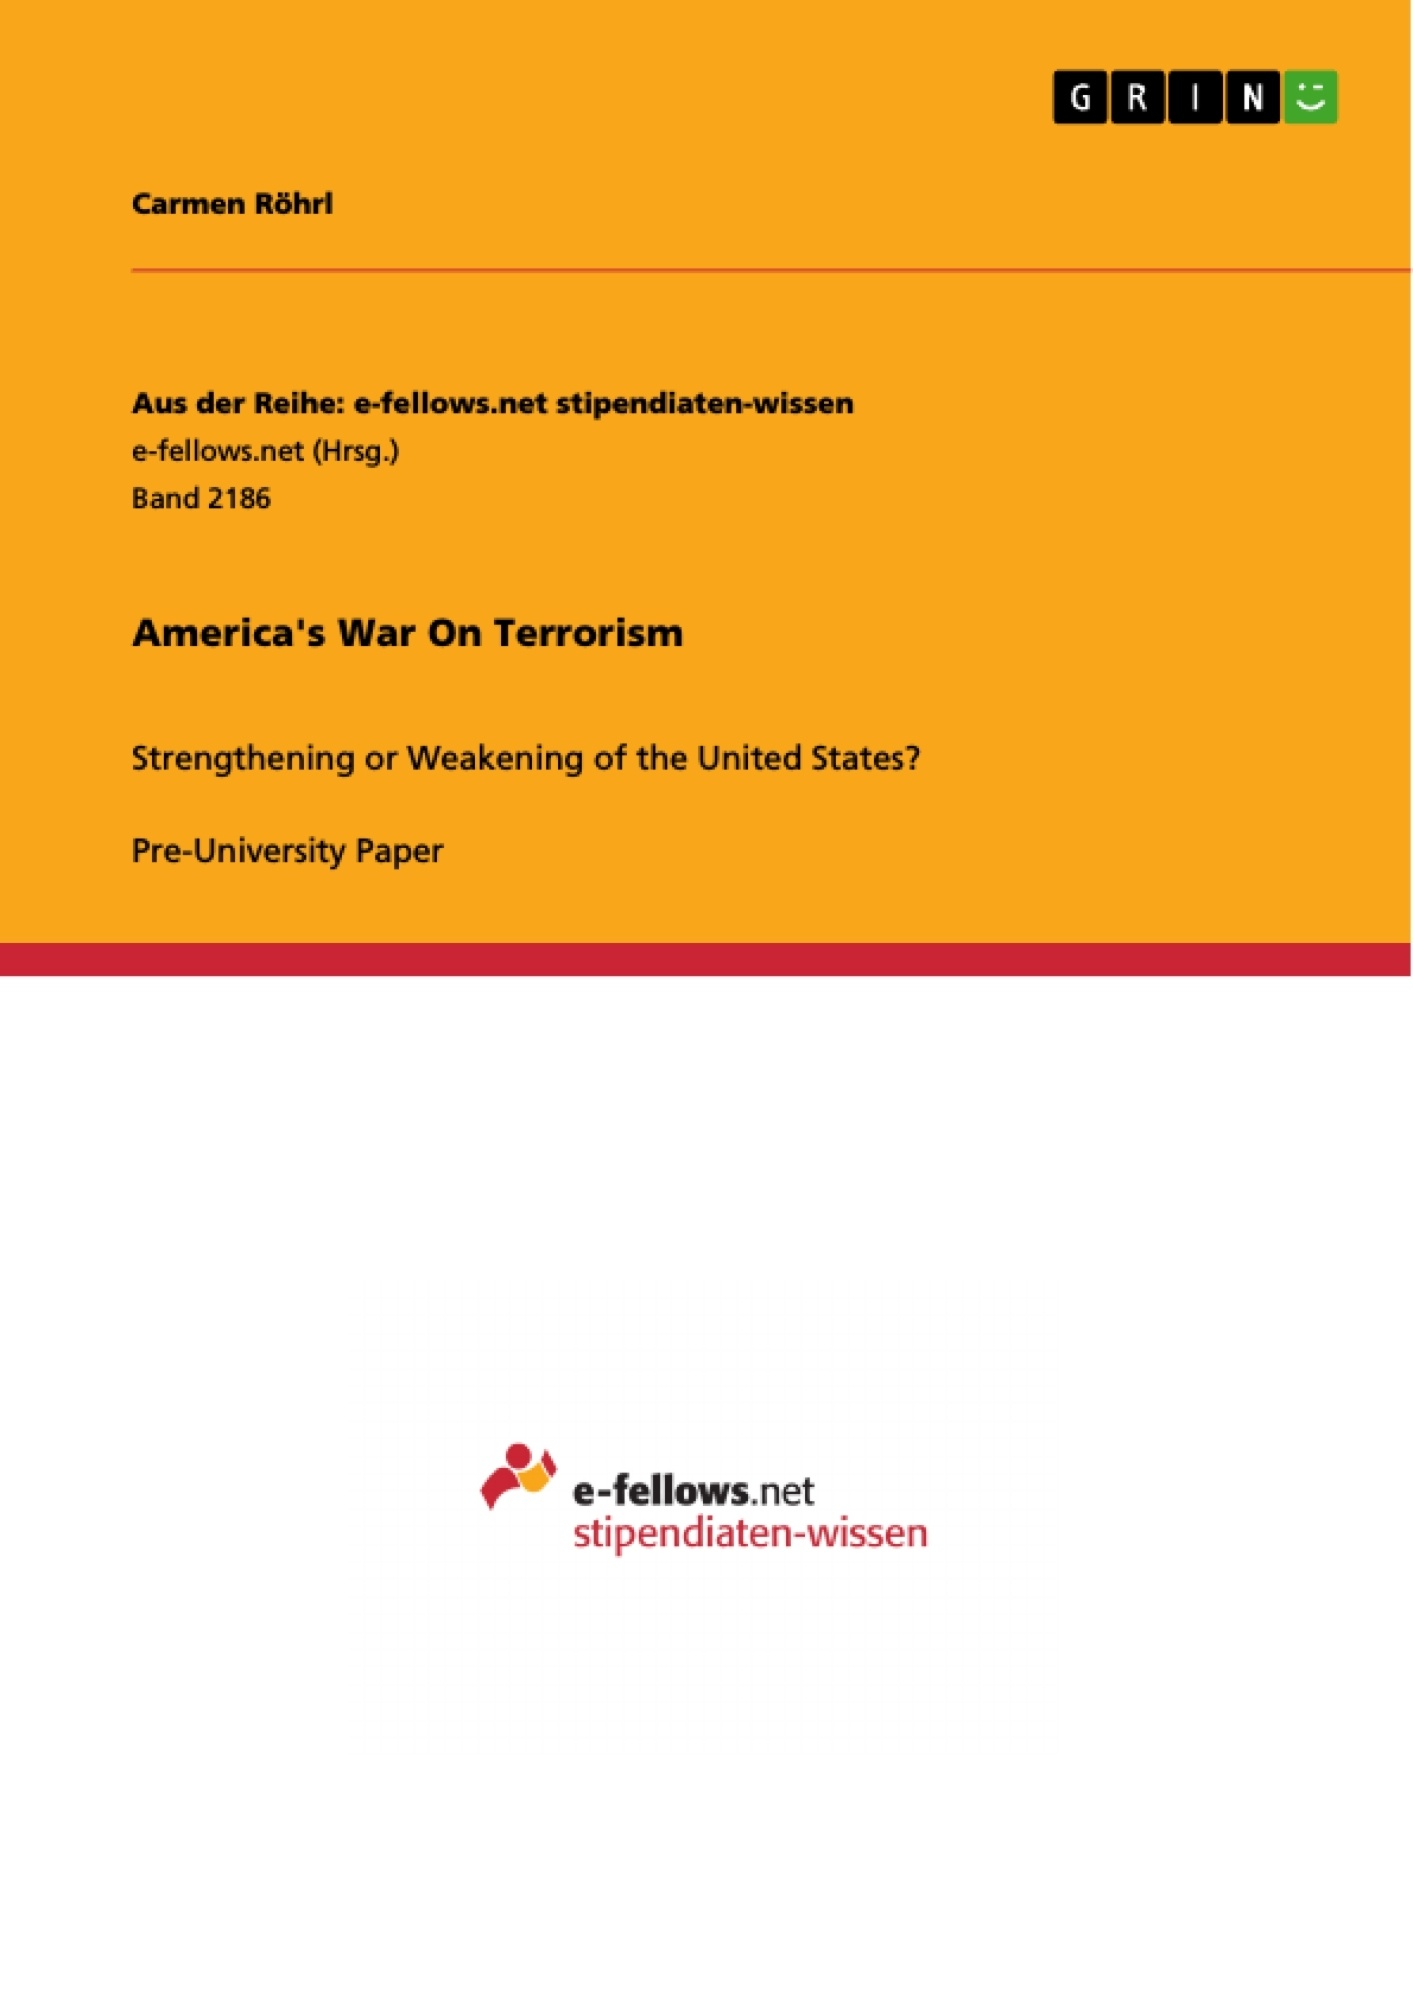 Title: America's War On Terrorism